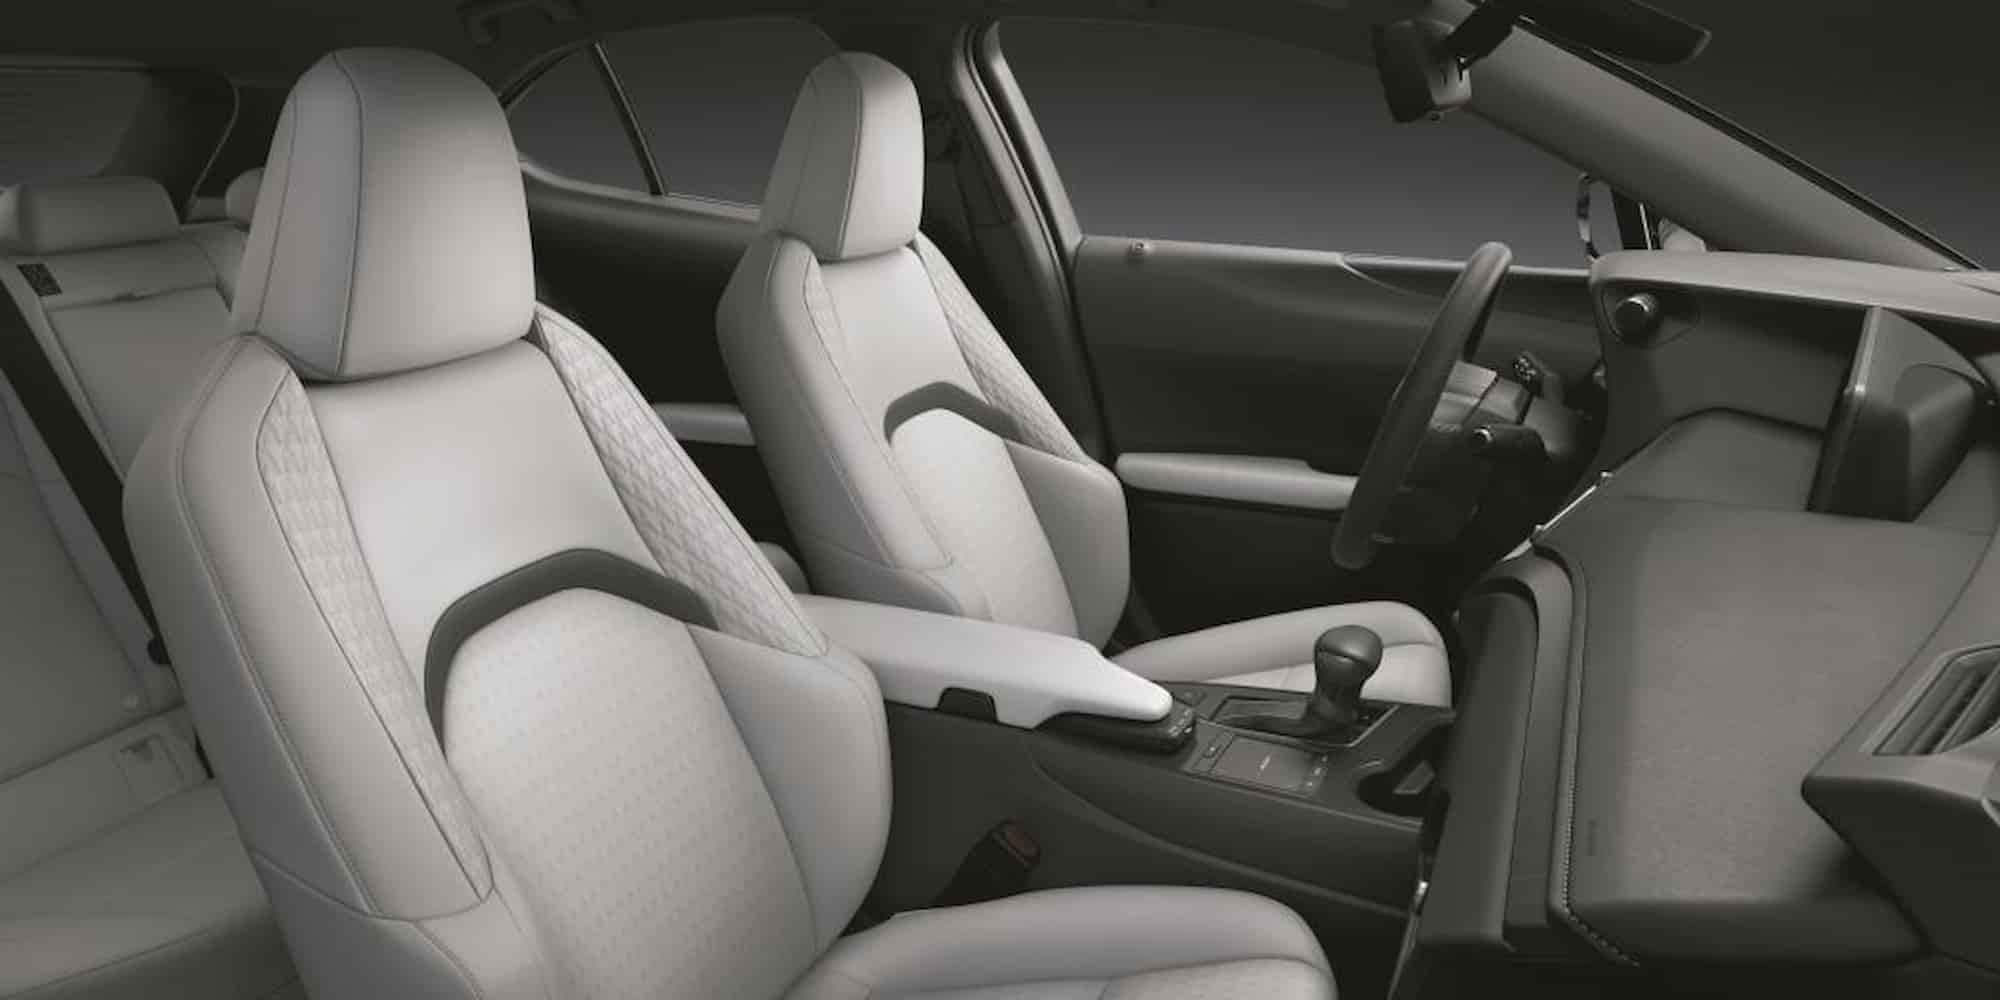 UX 250h MY22 interior 1